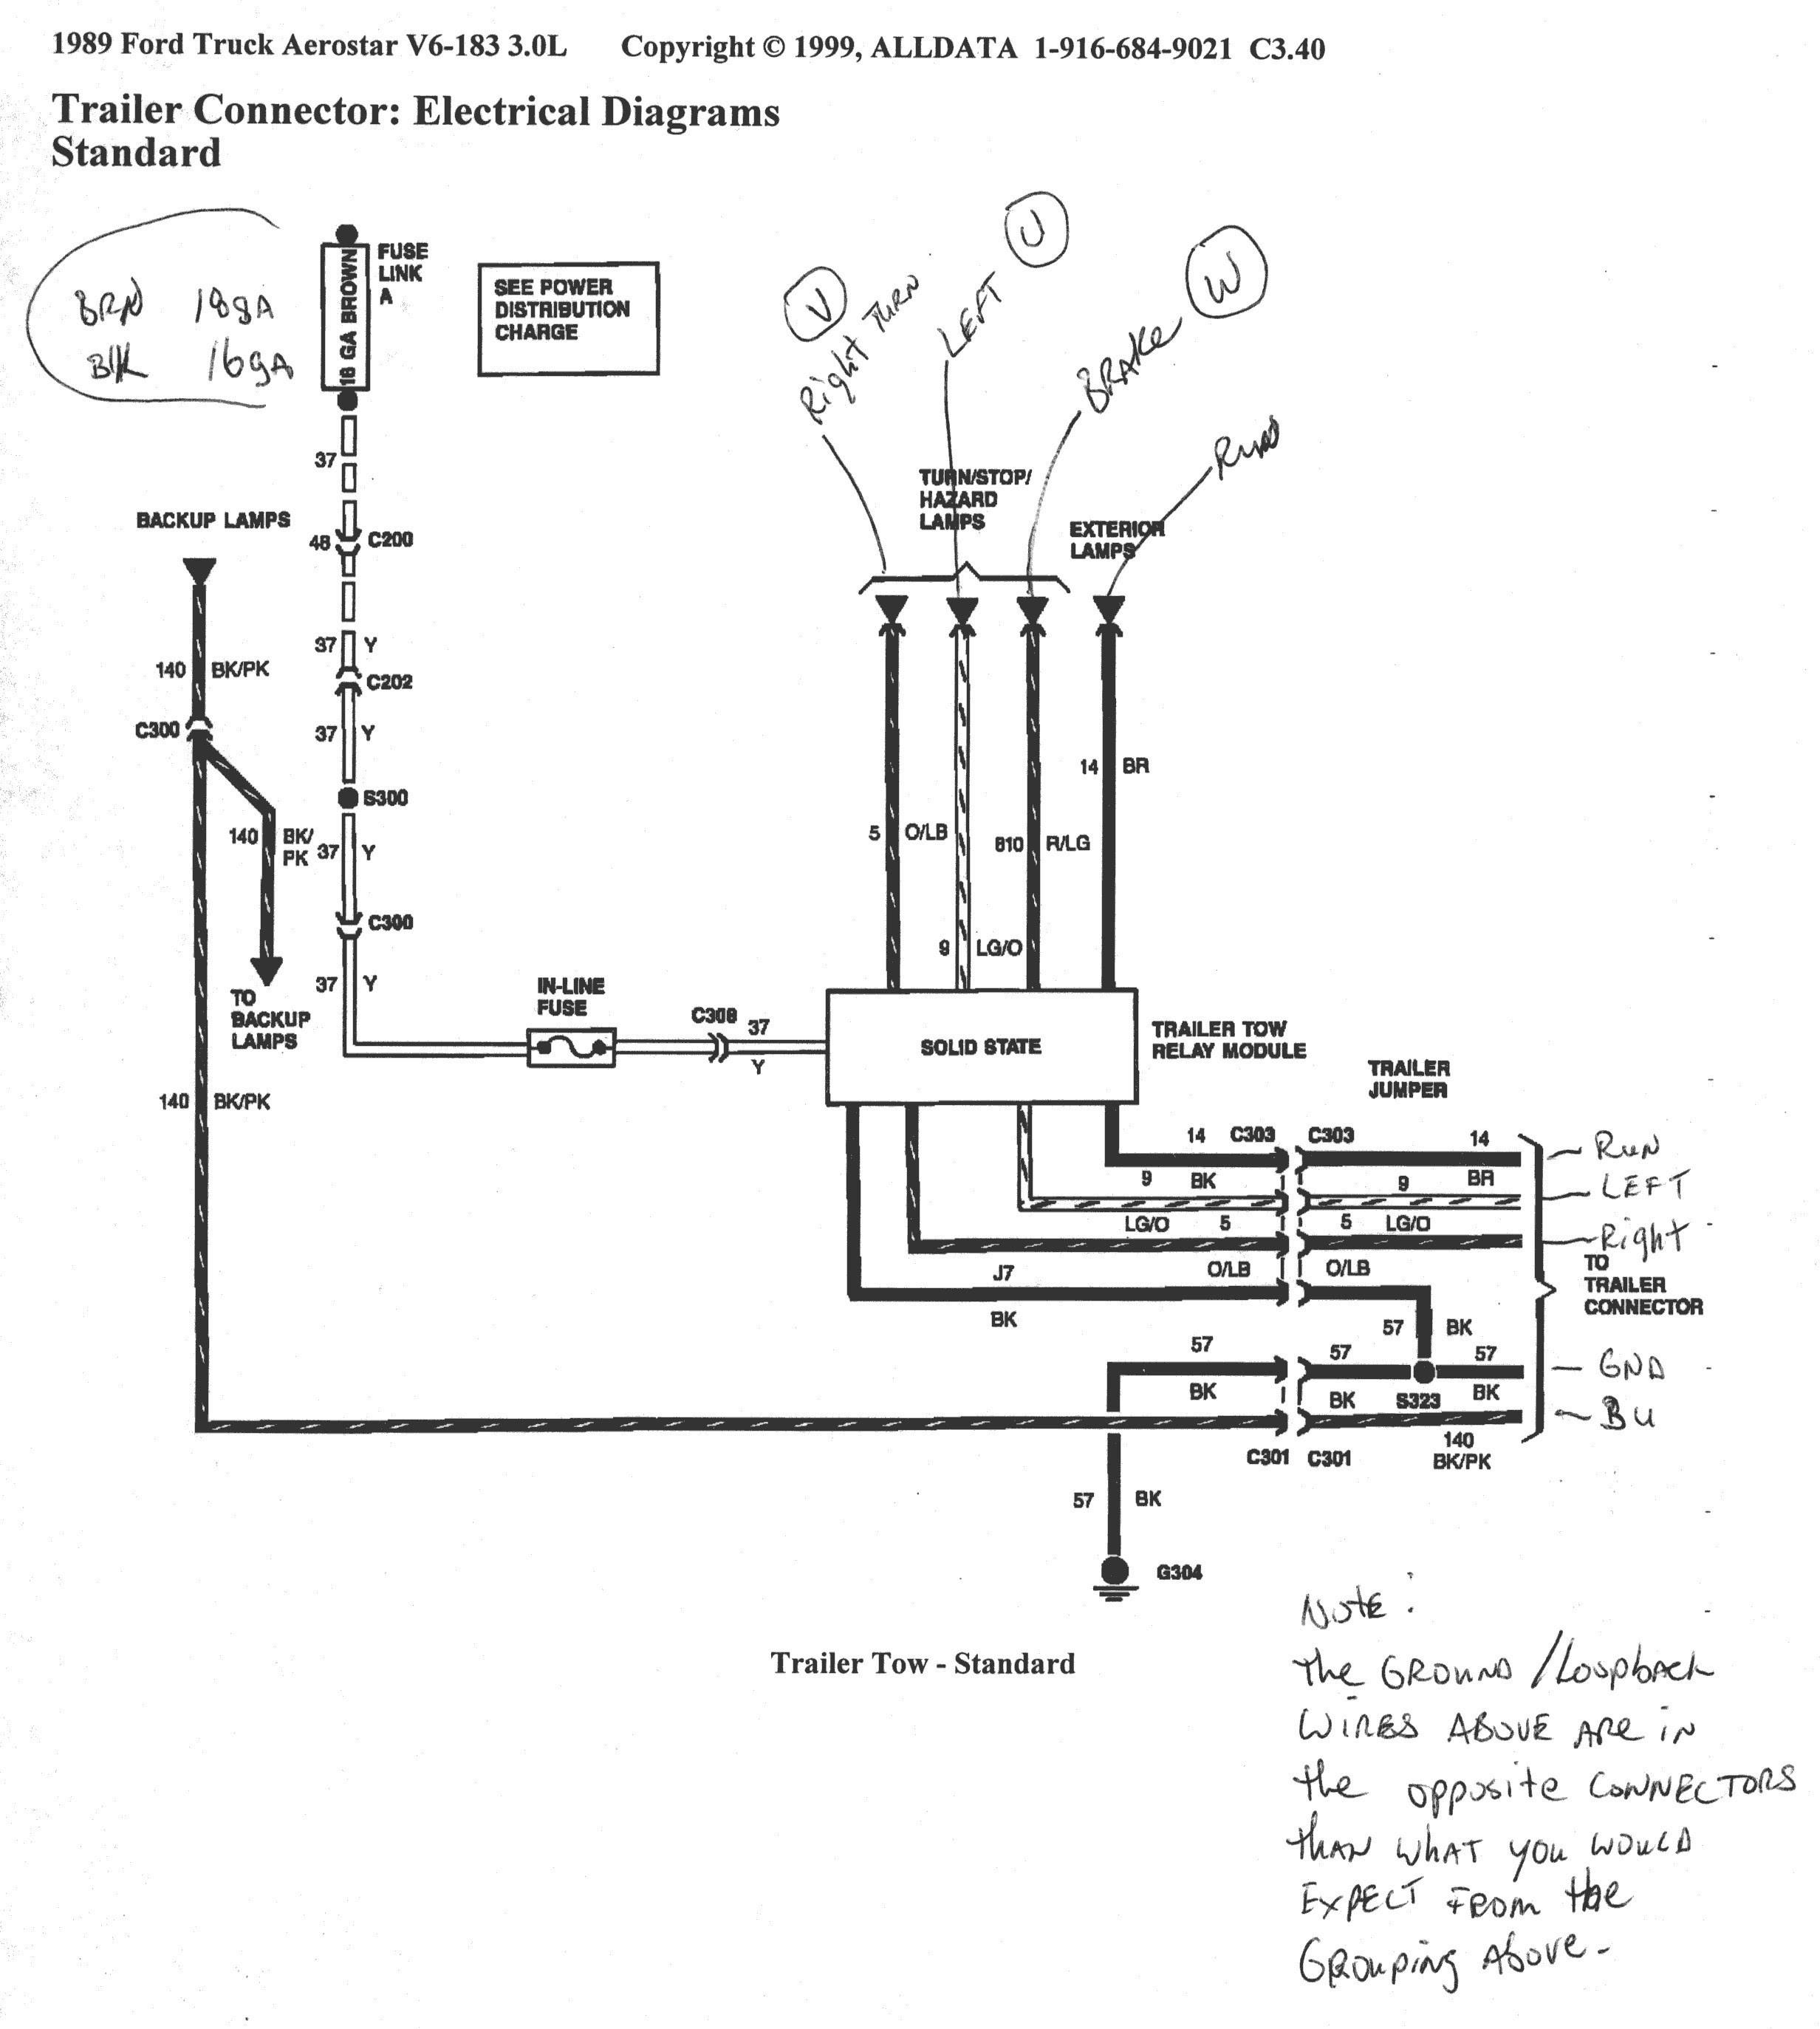 2011 F250 Brake Light Wiring Diagram Wiring Diagrams Premium A Premium A Chatteriedelavalleedufelin Fr